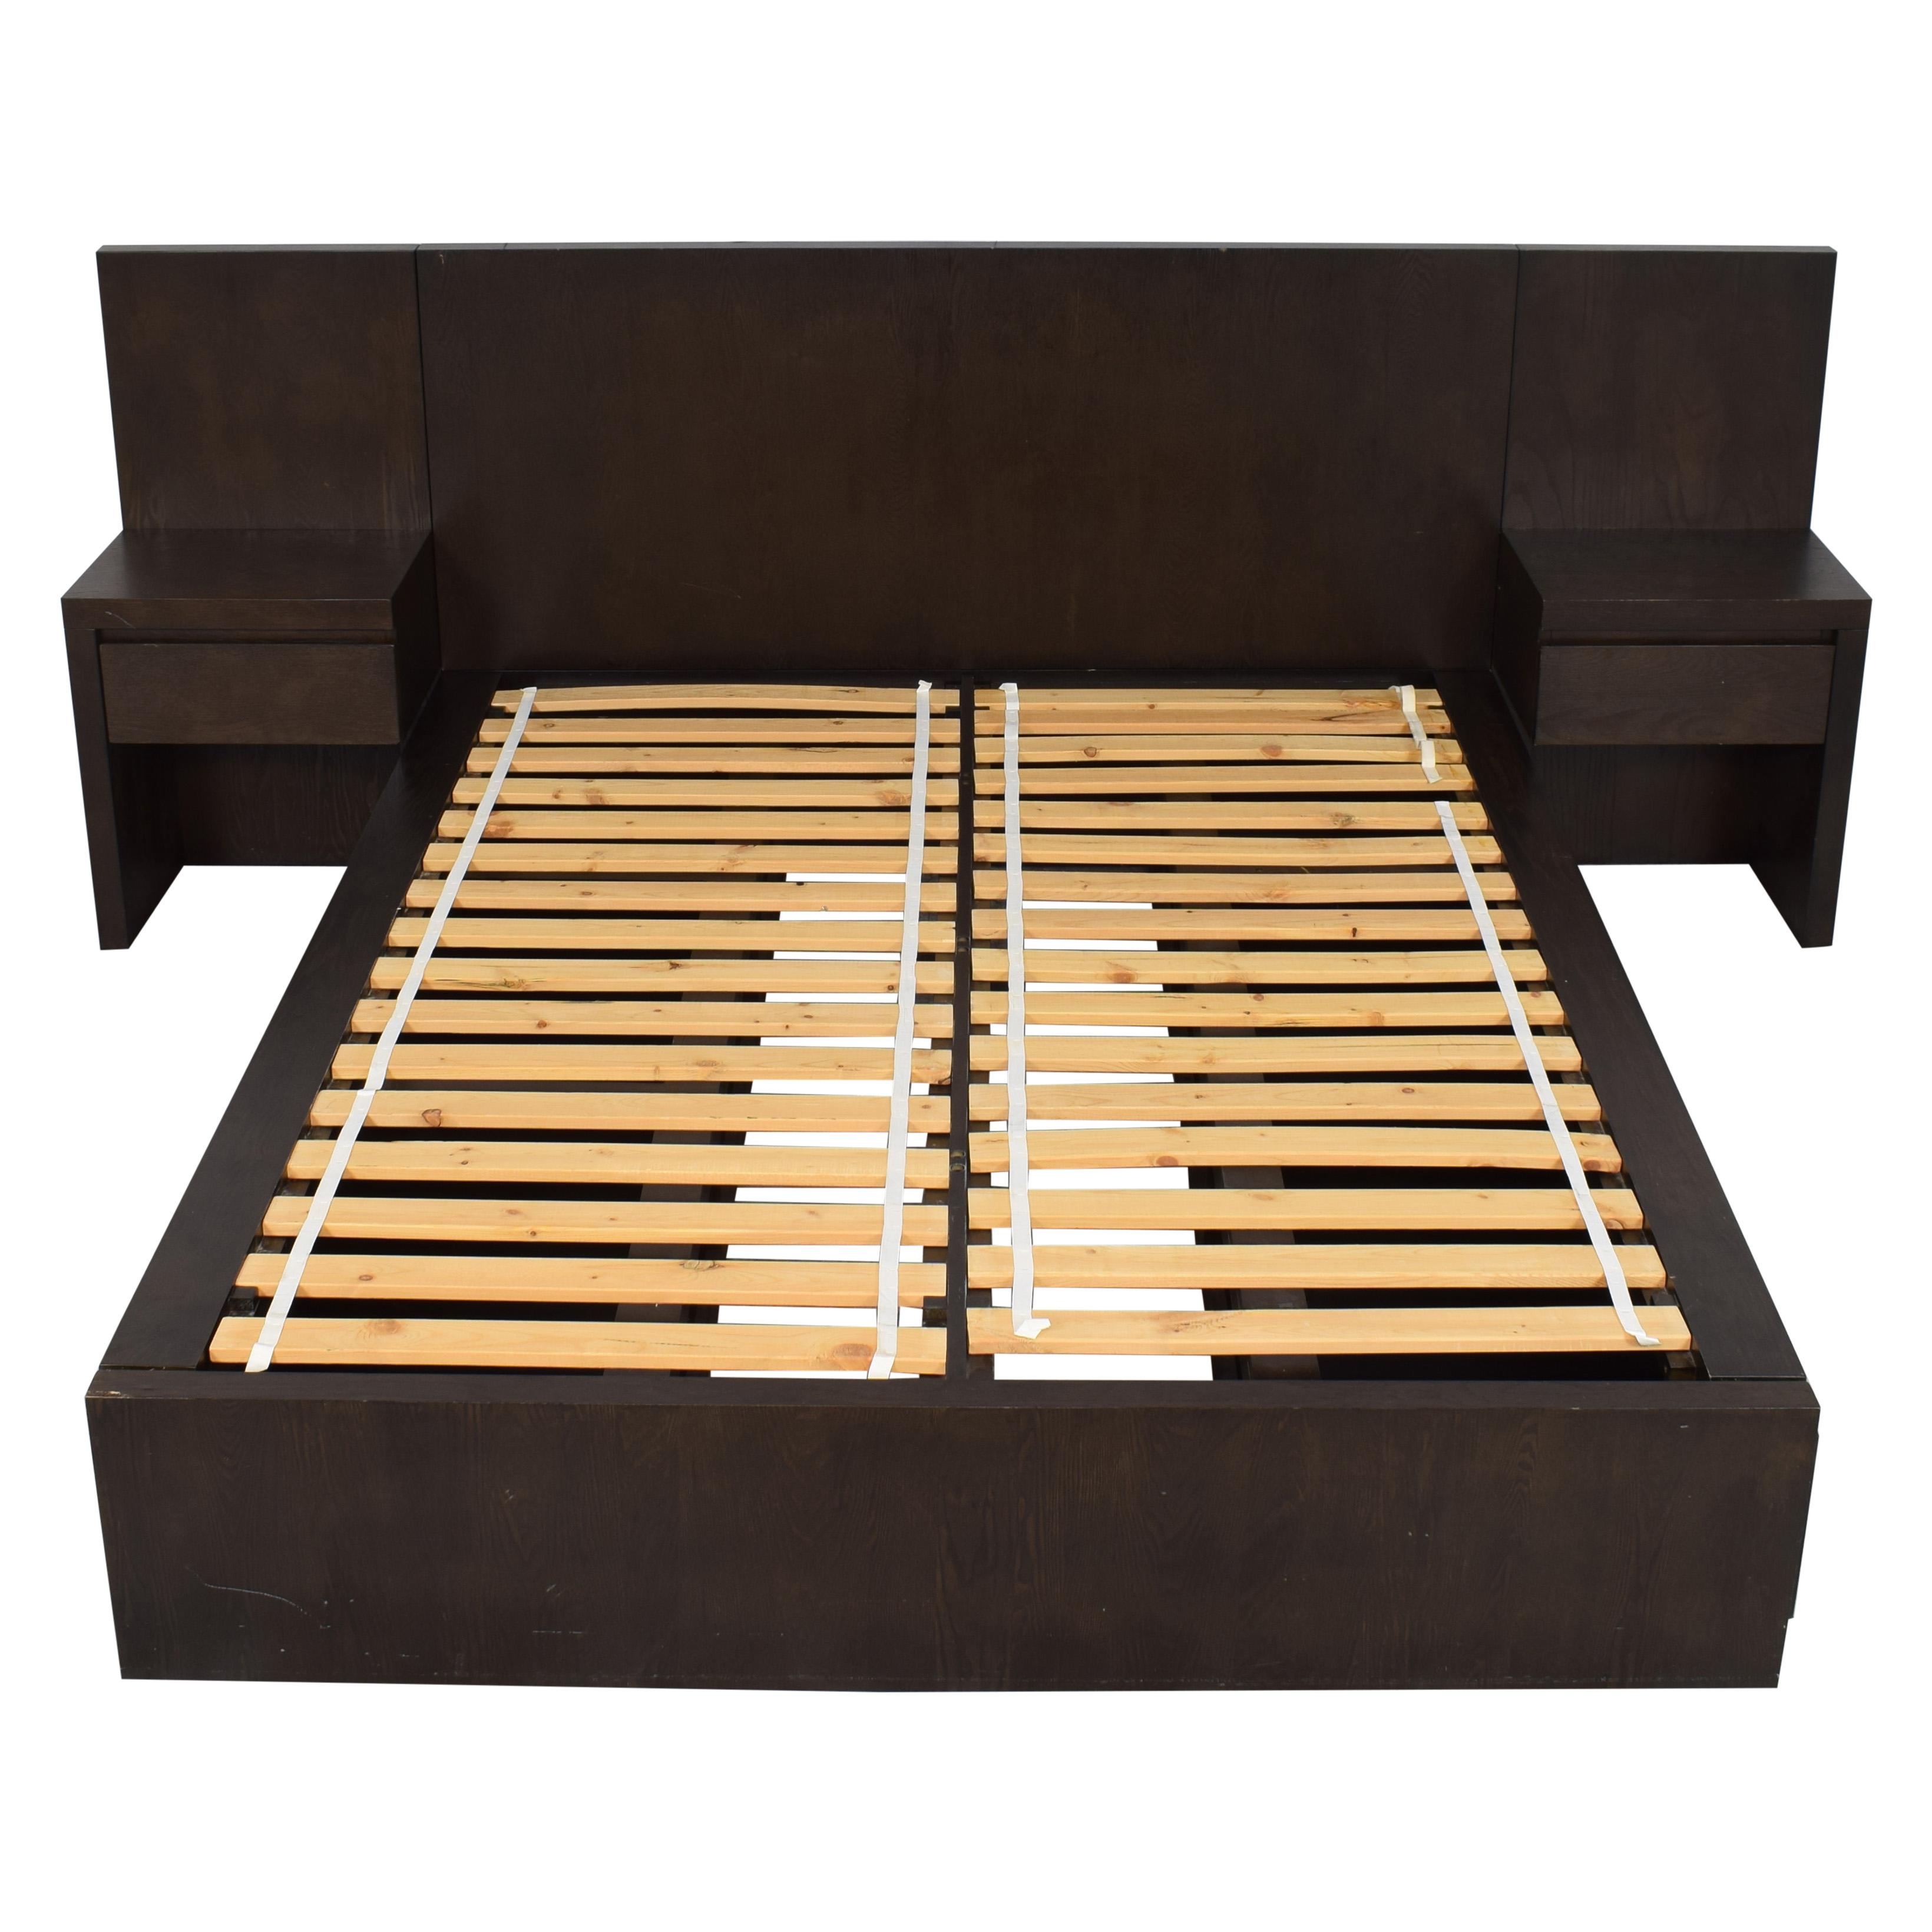 West Elm West Elm Queen Storage Bed with Nightstands dimensions